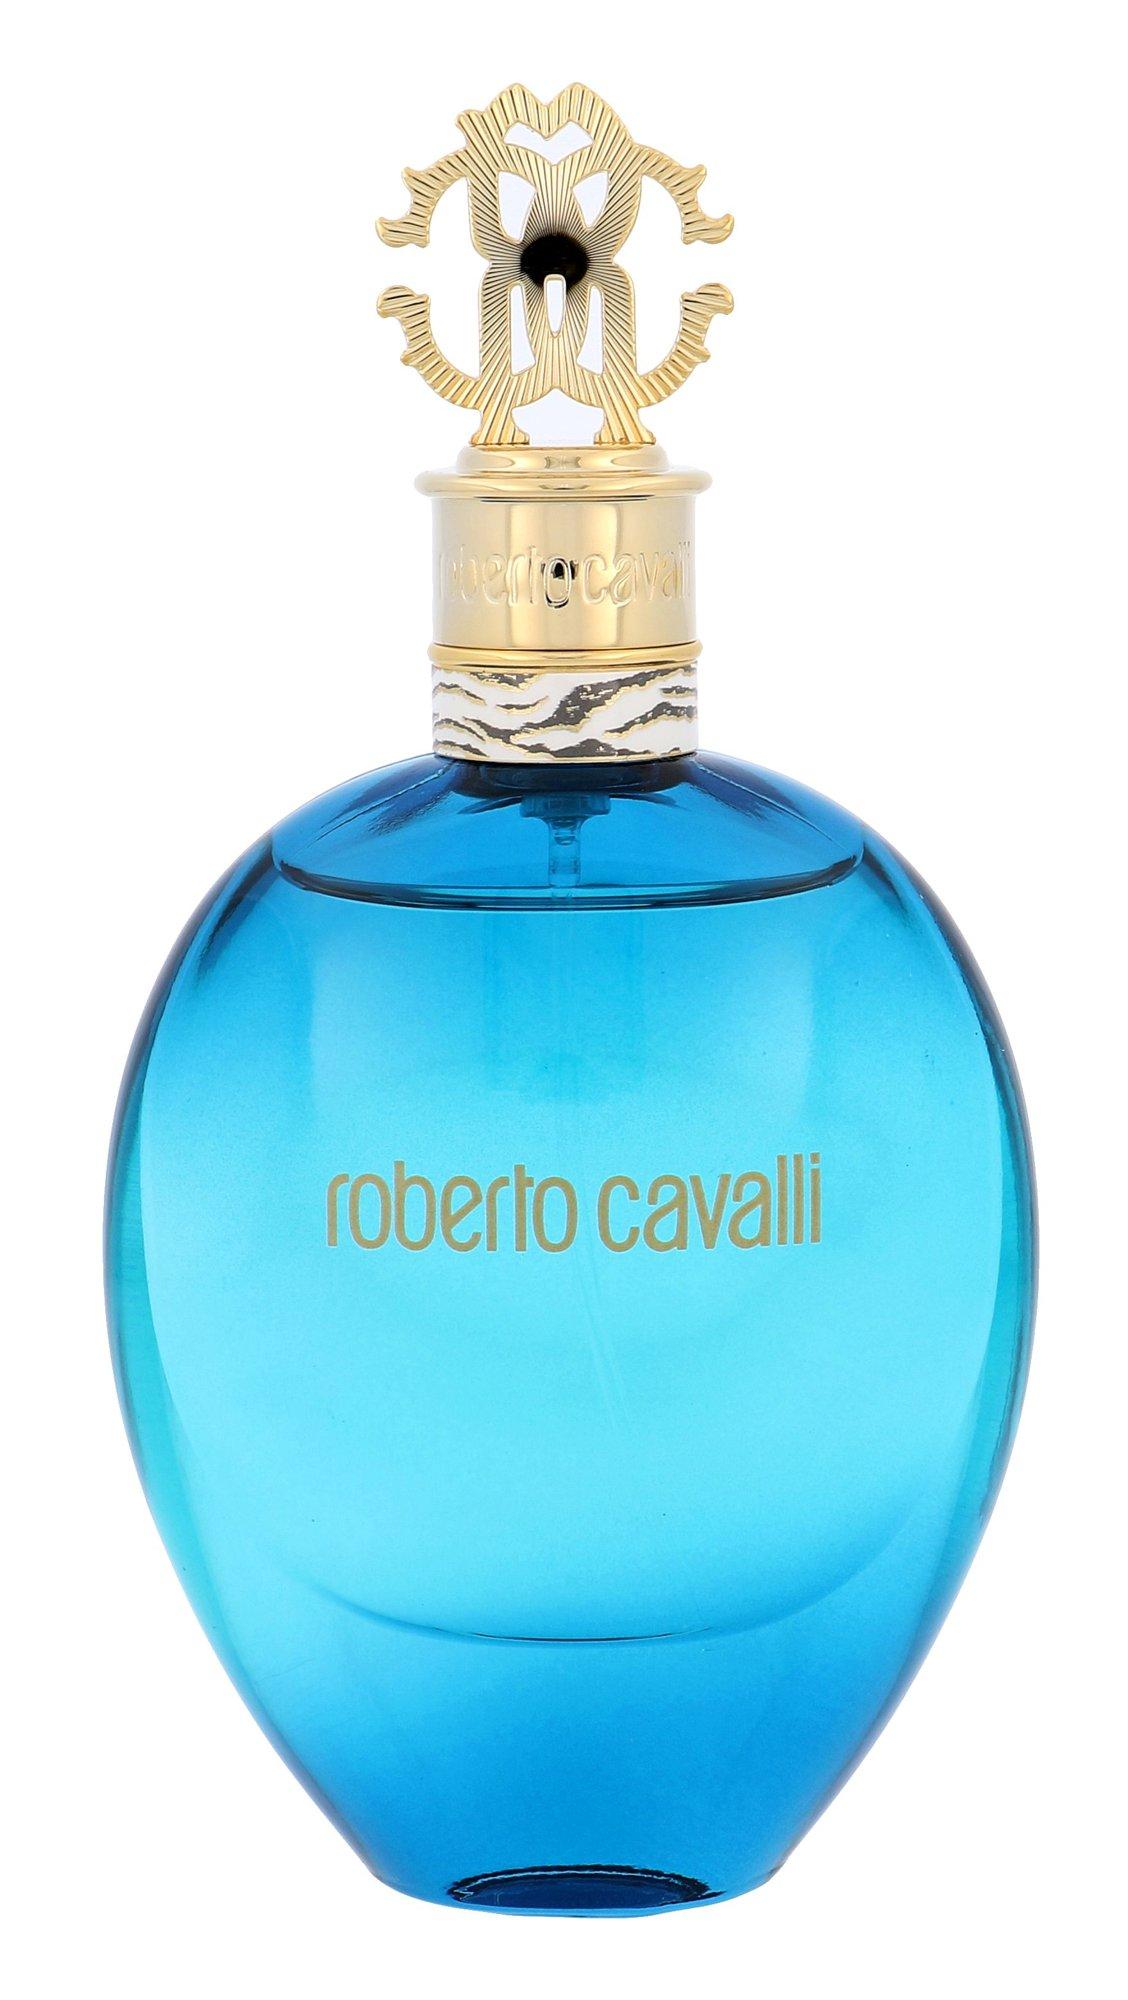 Roberto Cavalli Acqua EDT 75ml